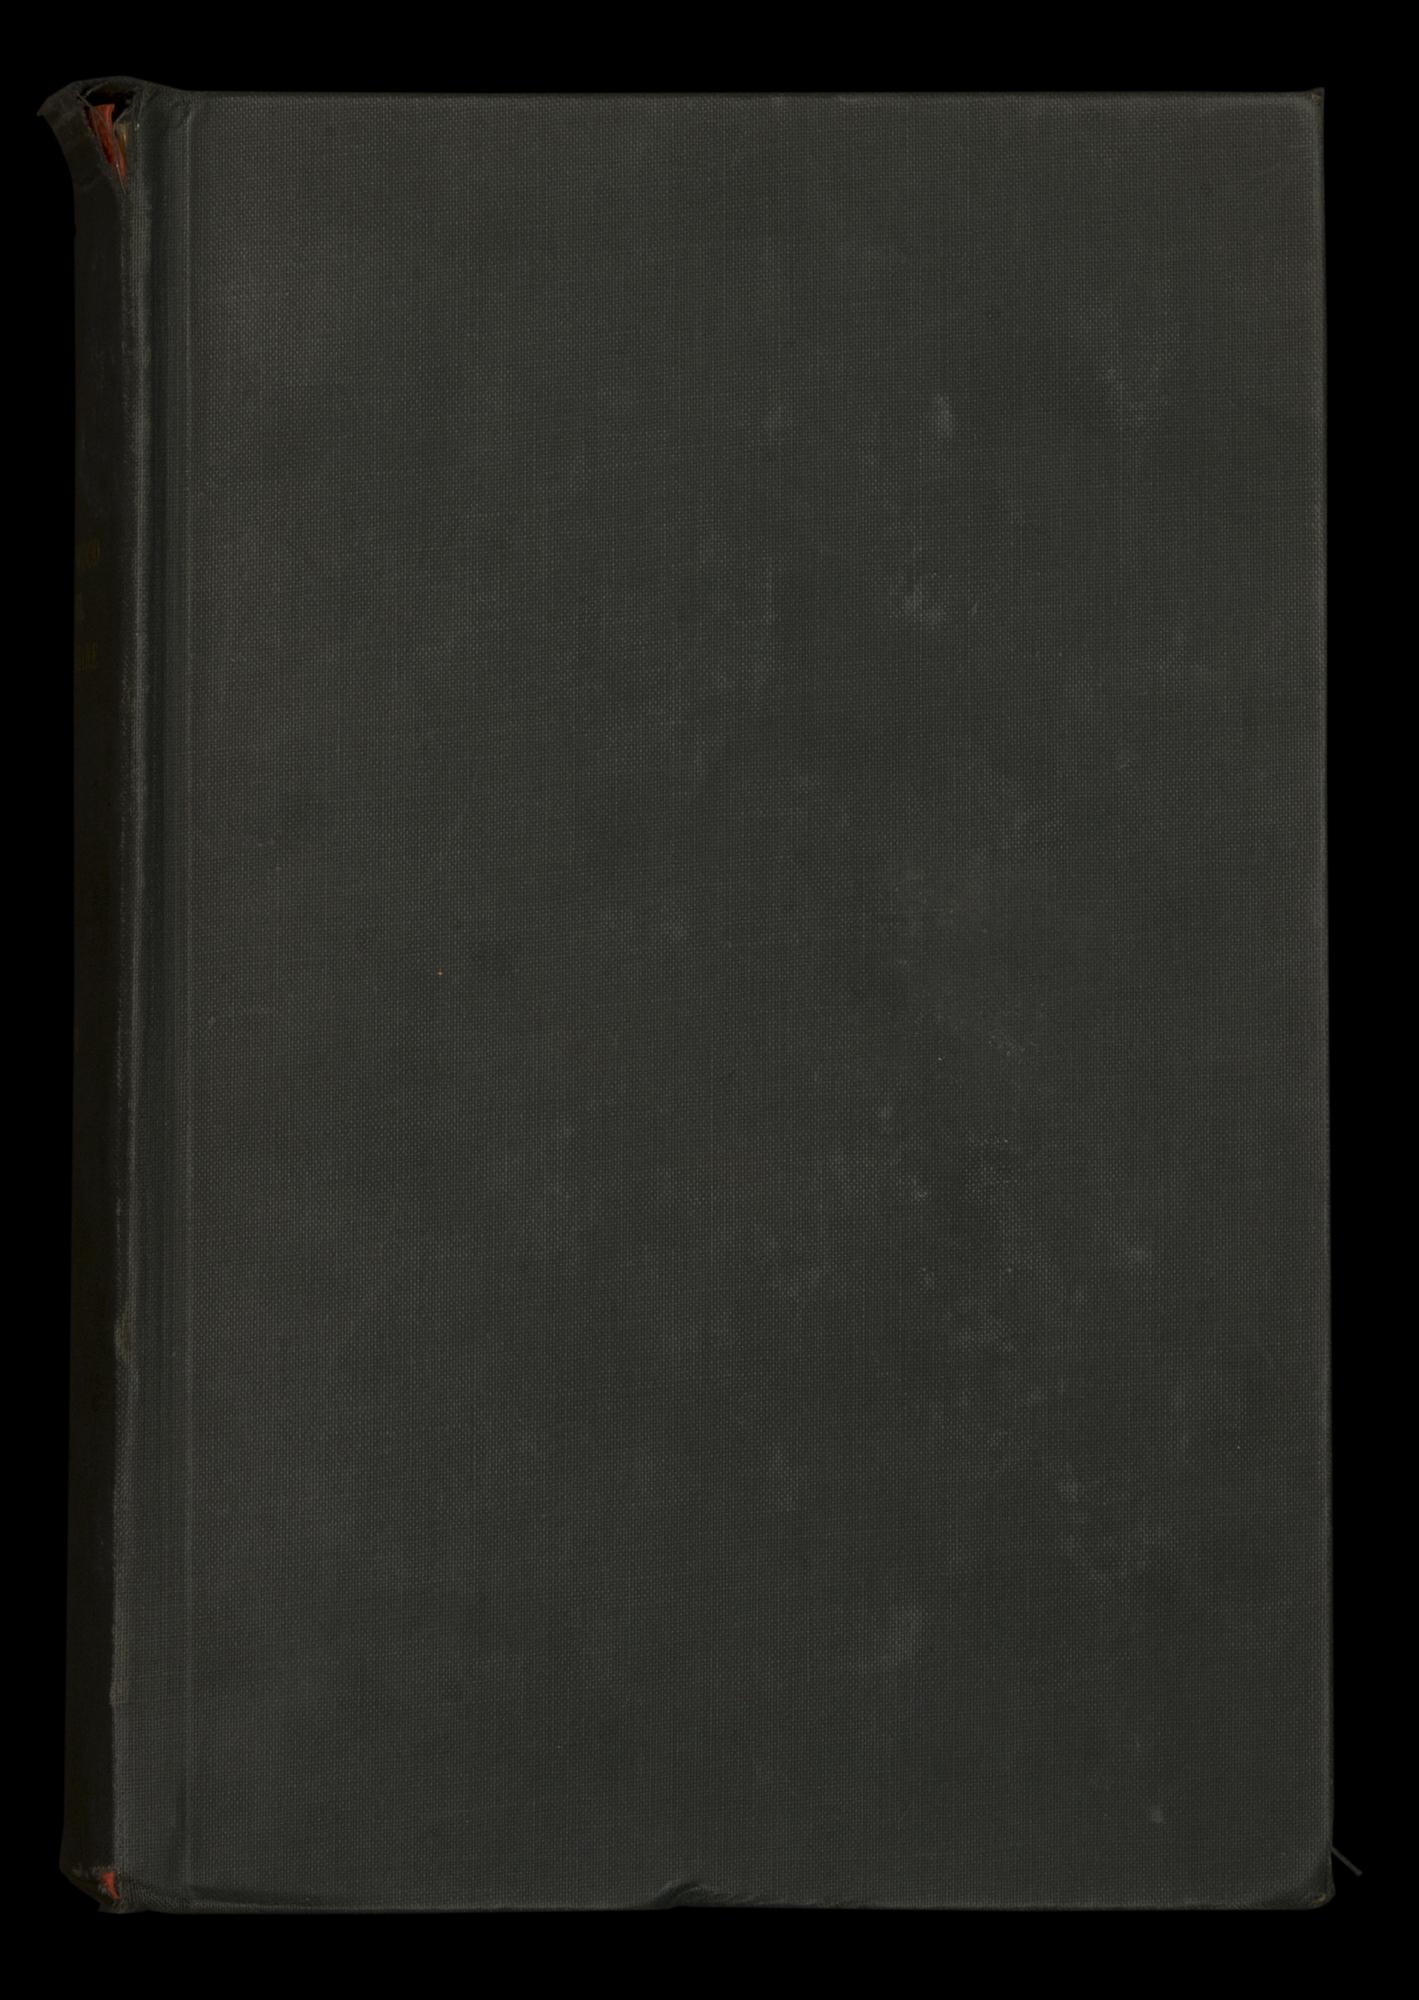 HB_ProgramBook_Cover_1958.jpg